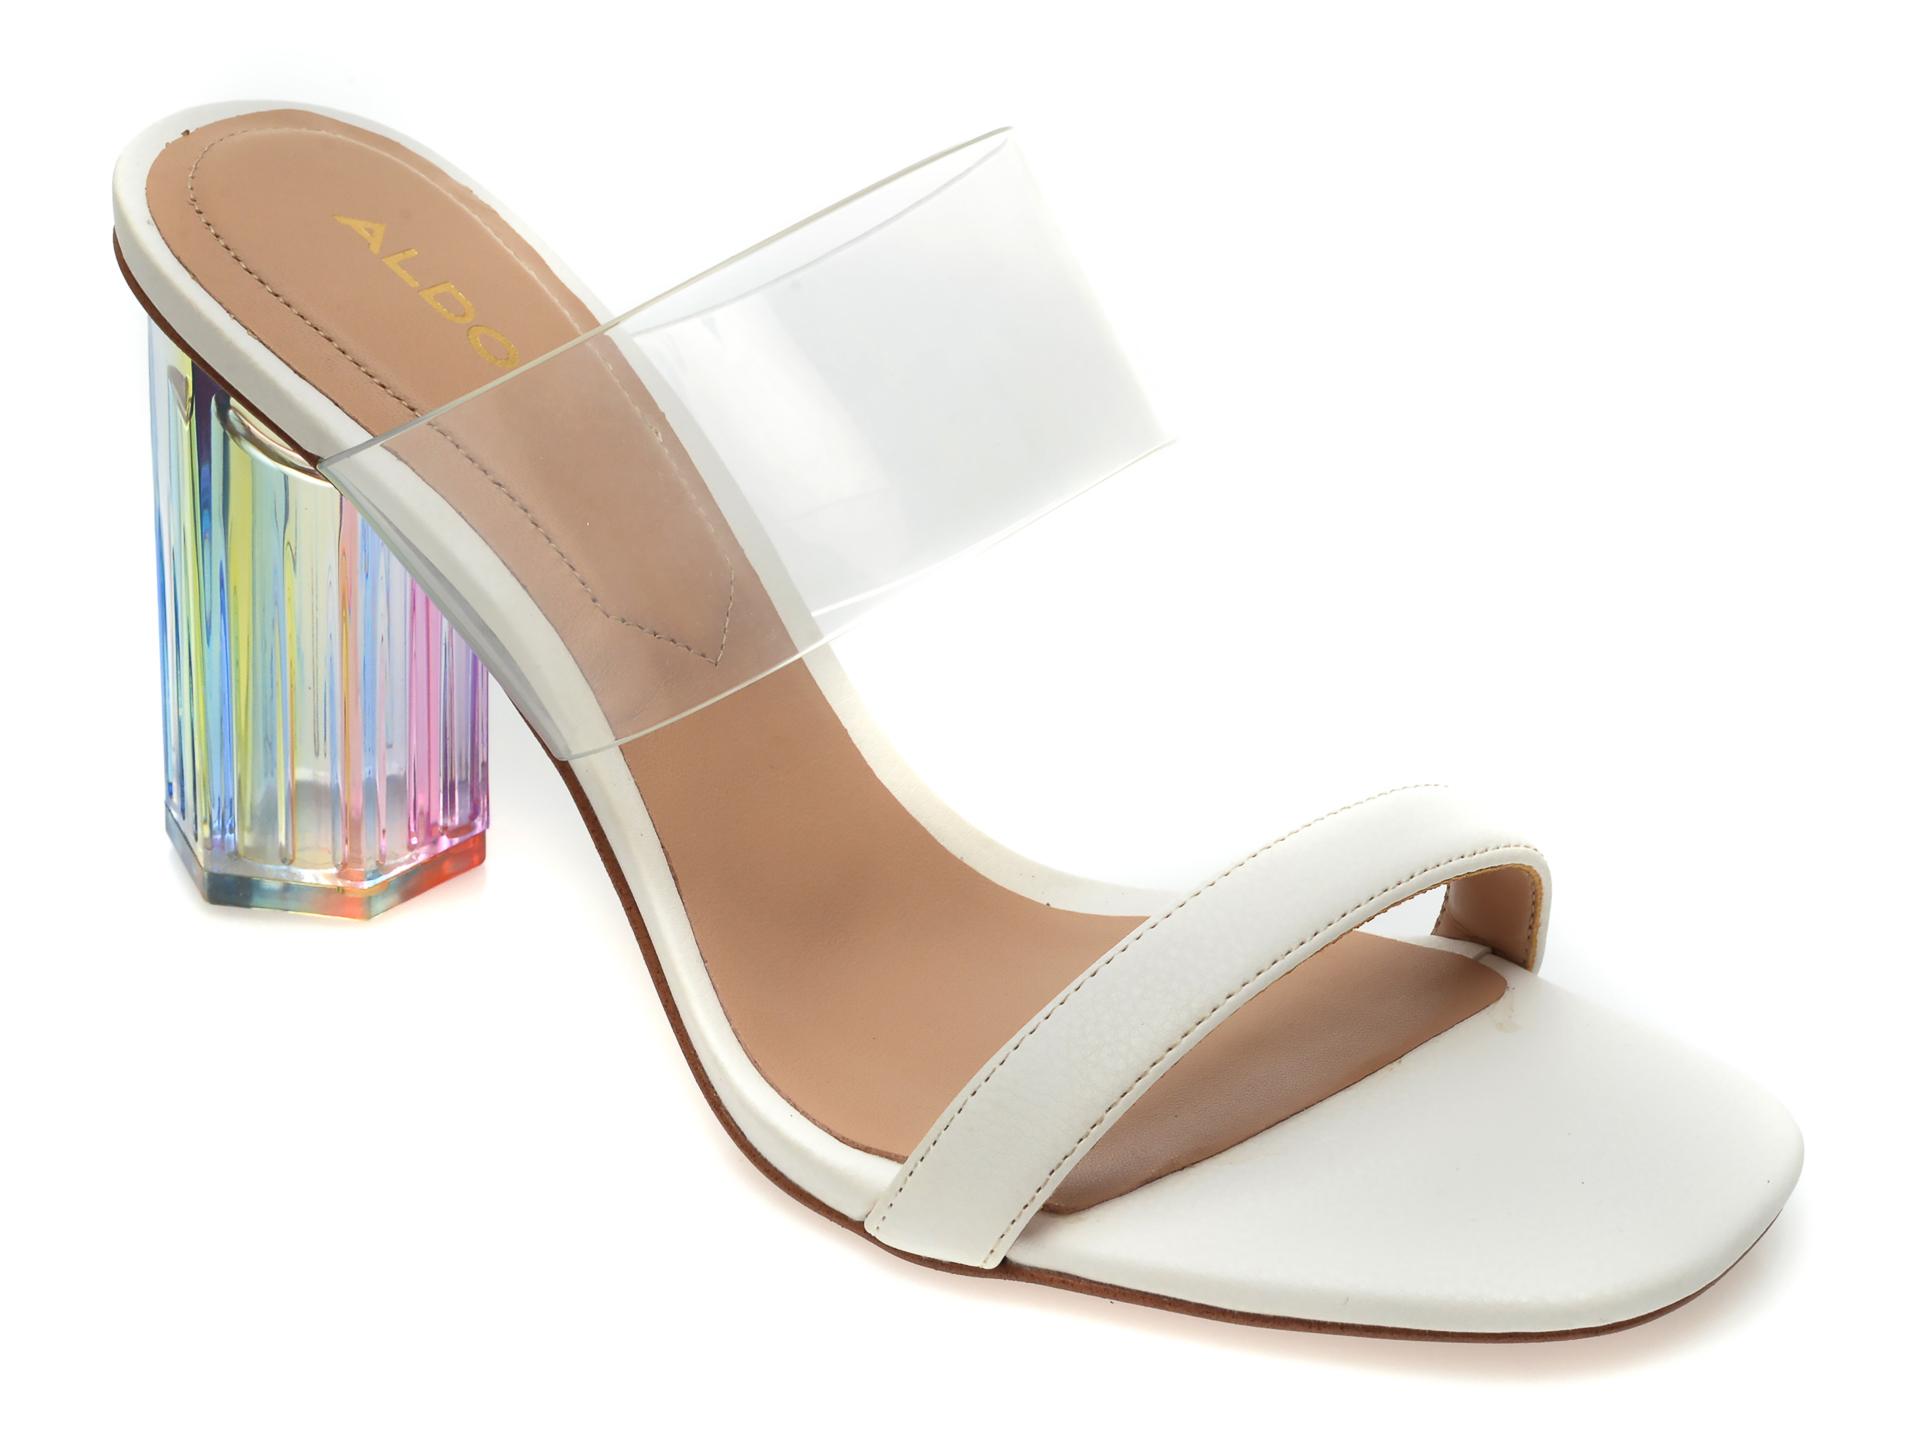 Papuci ALDO albi, Clara100, din piele ecologica imagine otter.ro